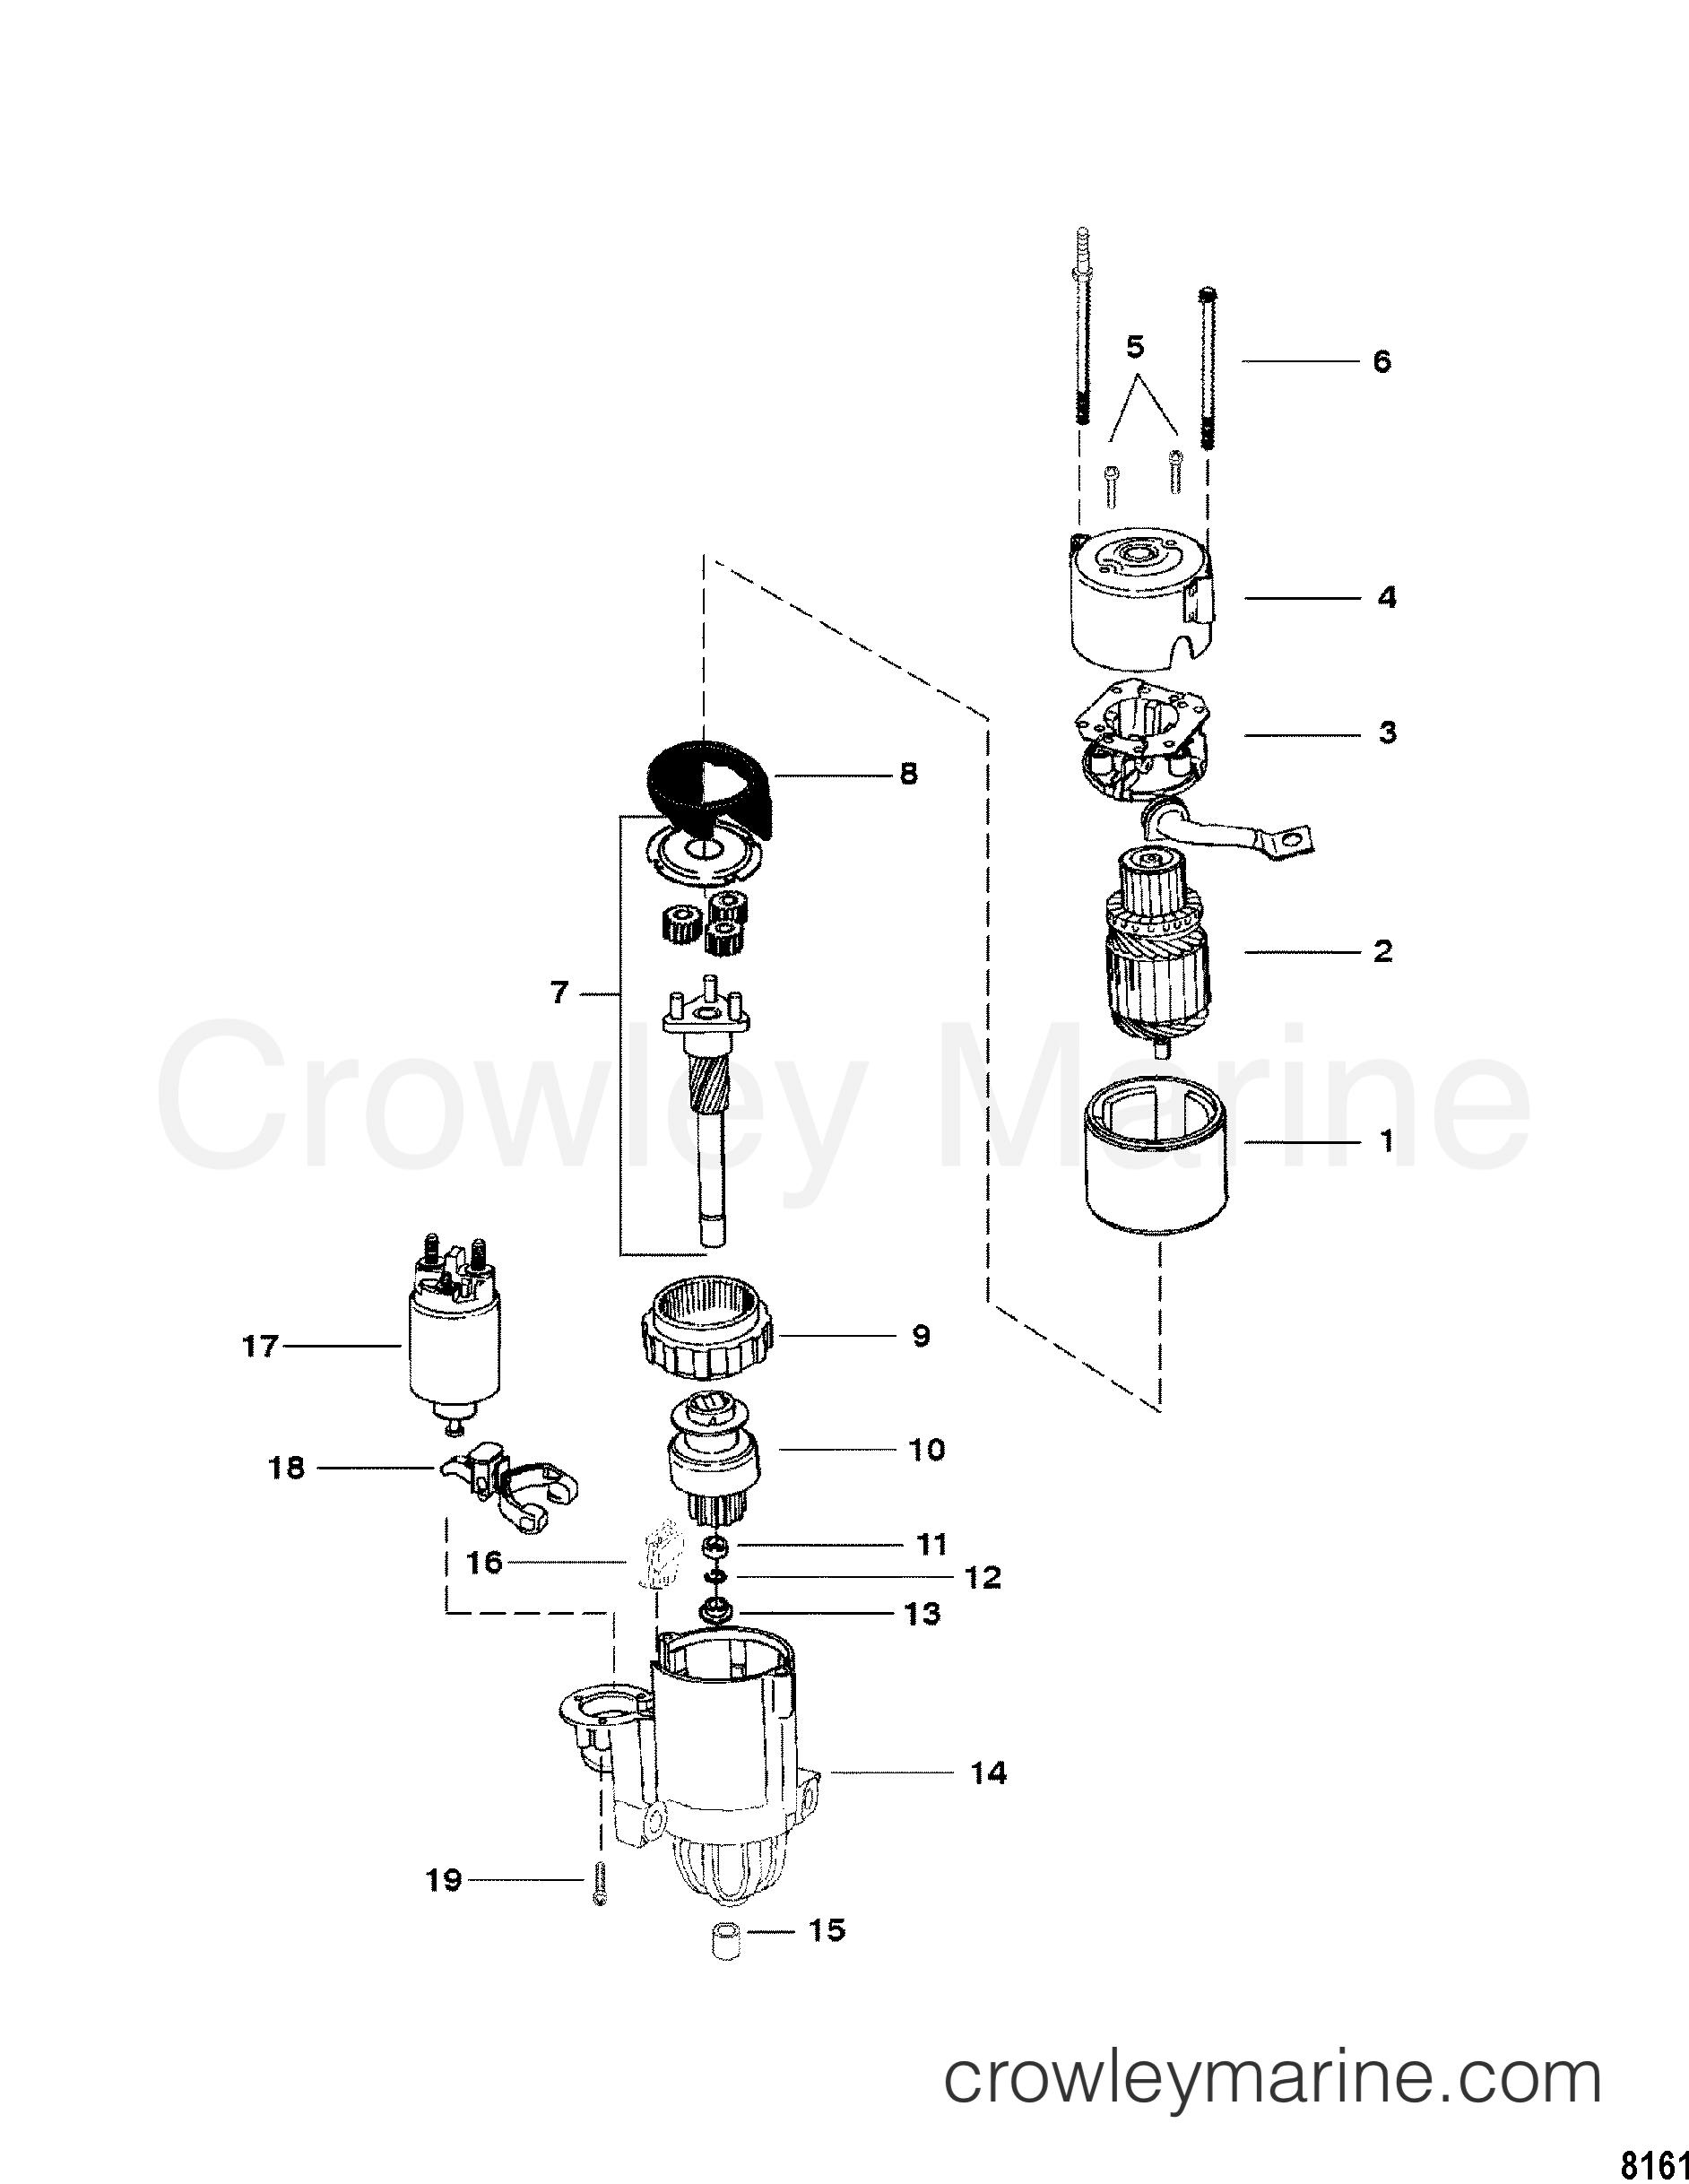 1996 Mercruiser 3.0LX [ALPHA] - 430L000JS - STARTER MOTOR section